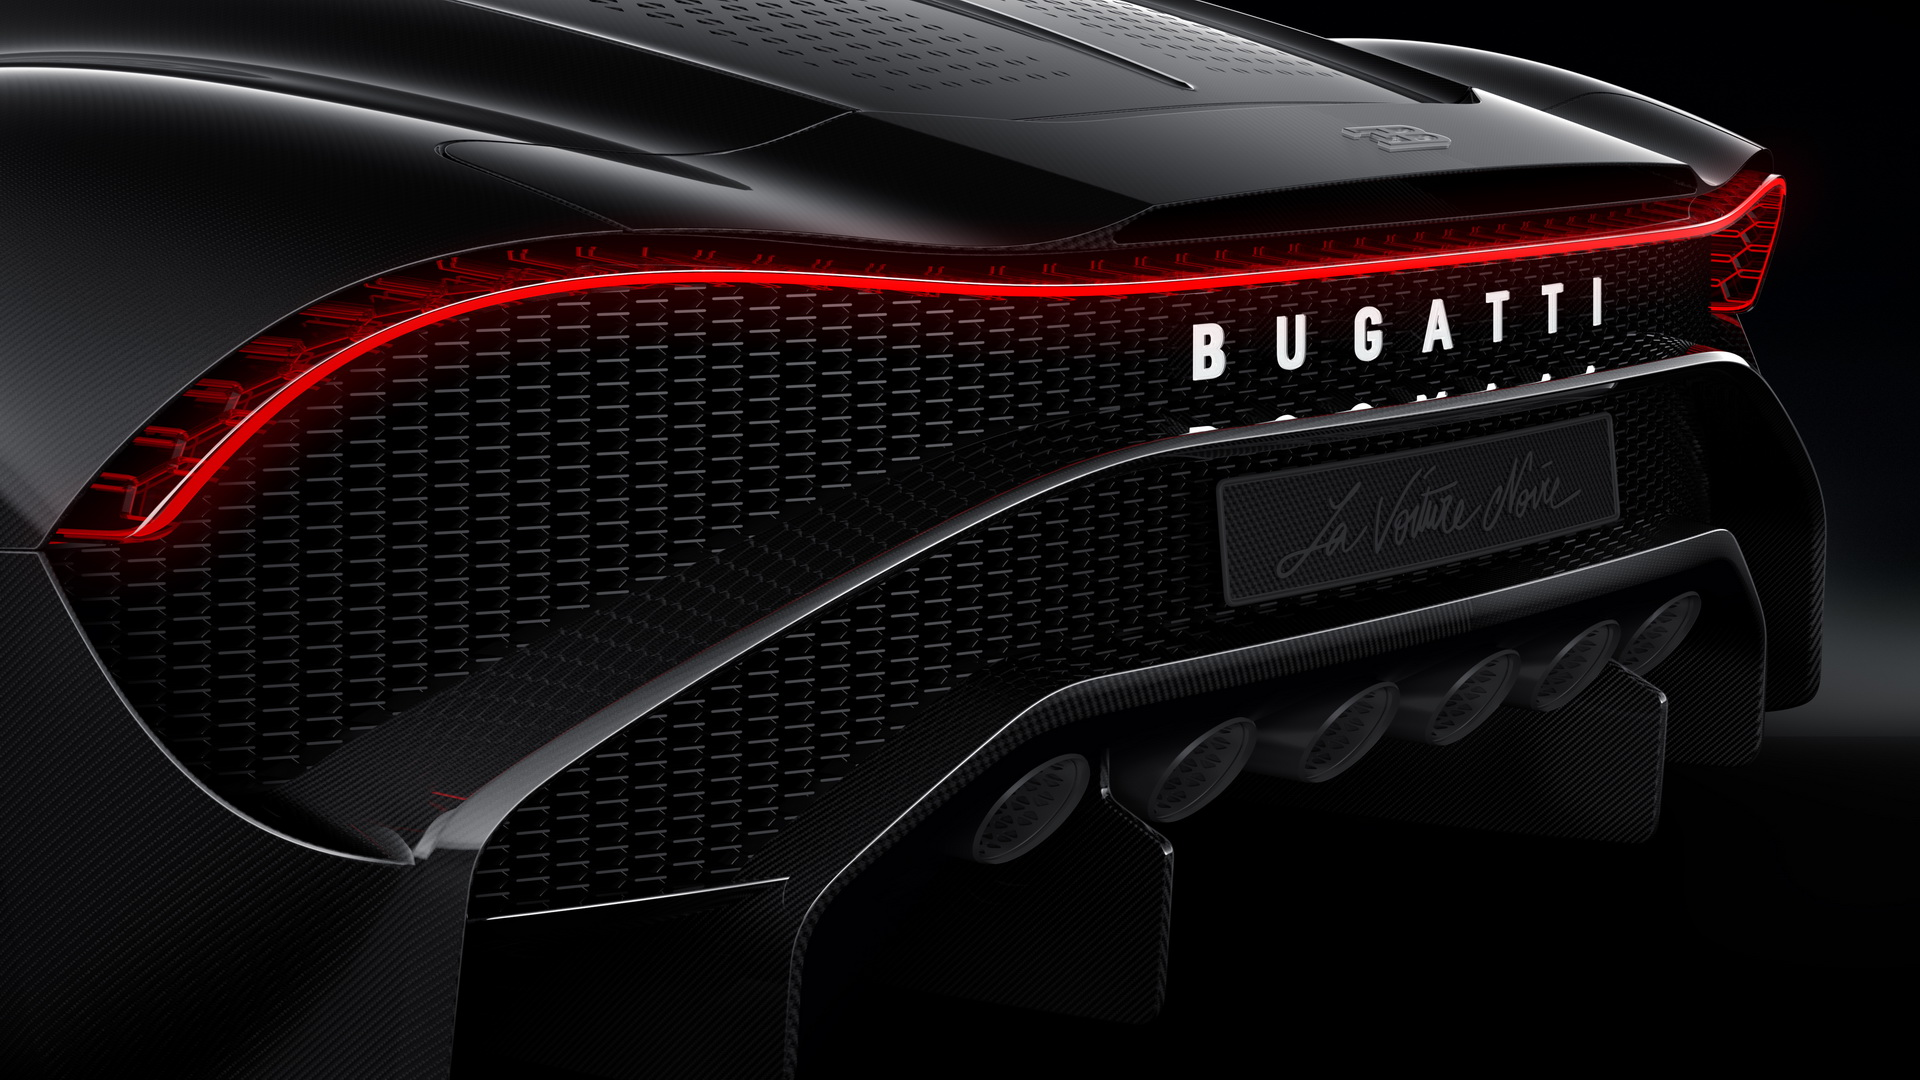 5b8e0d48-2019-bugatti-la-voiture-noire-6.jpg